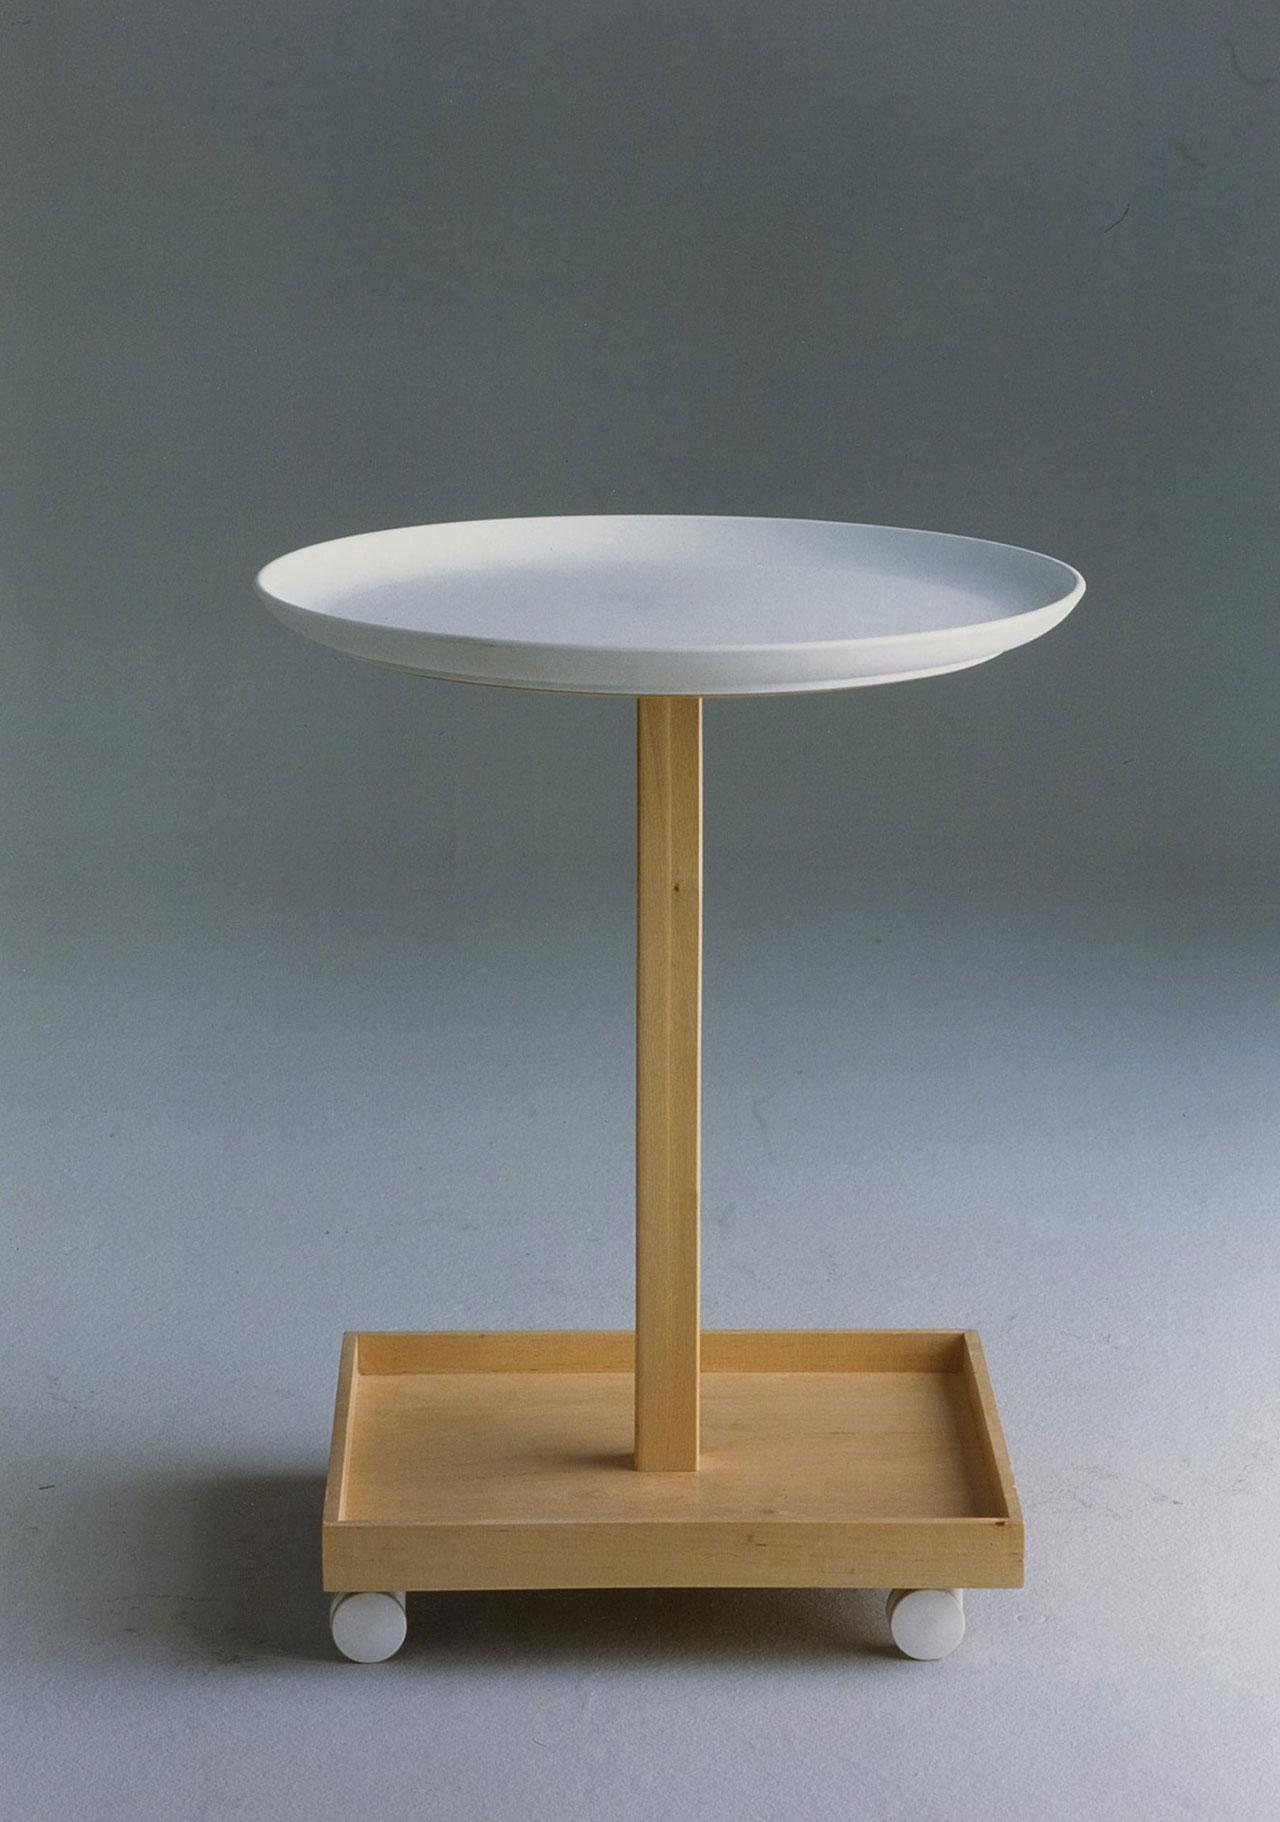 Björkö Table for IKEA Photo: Massproductions